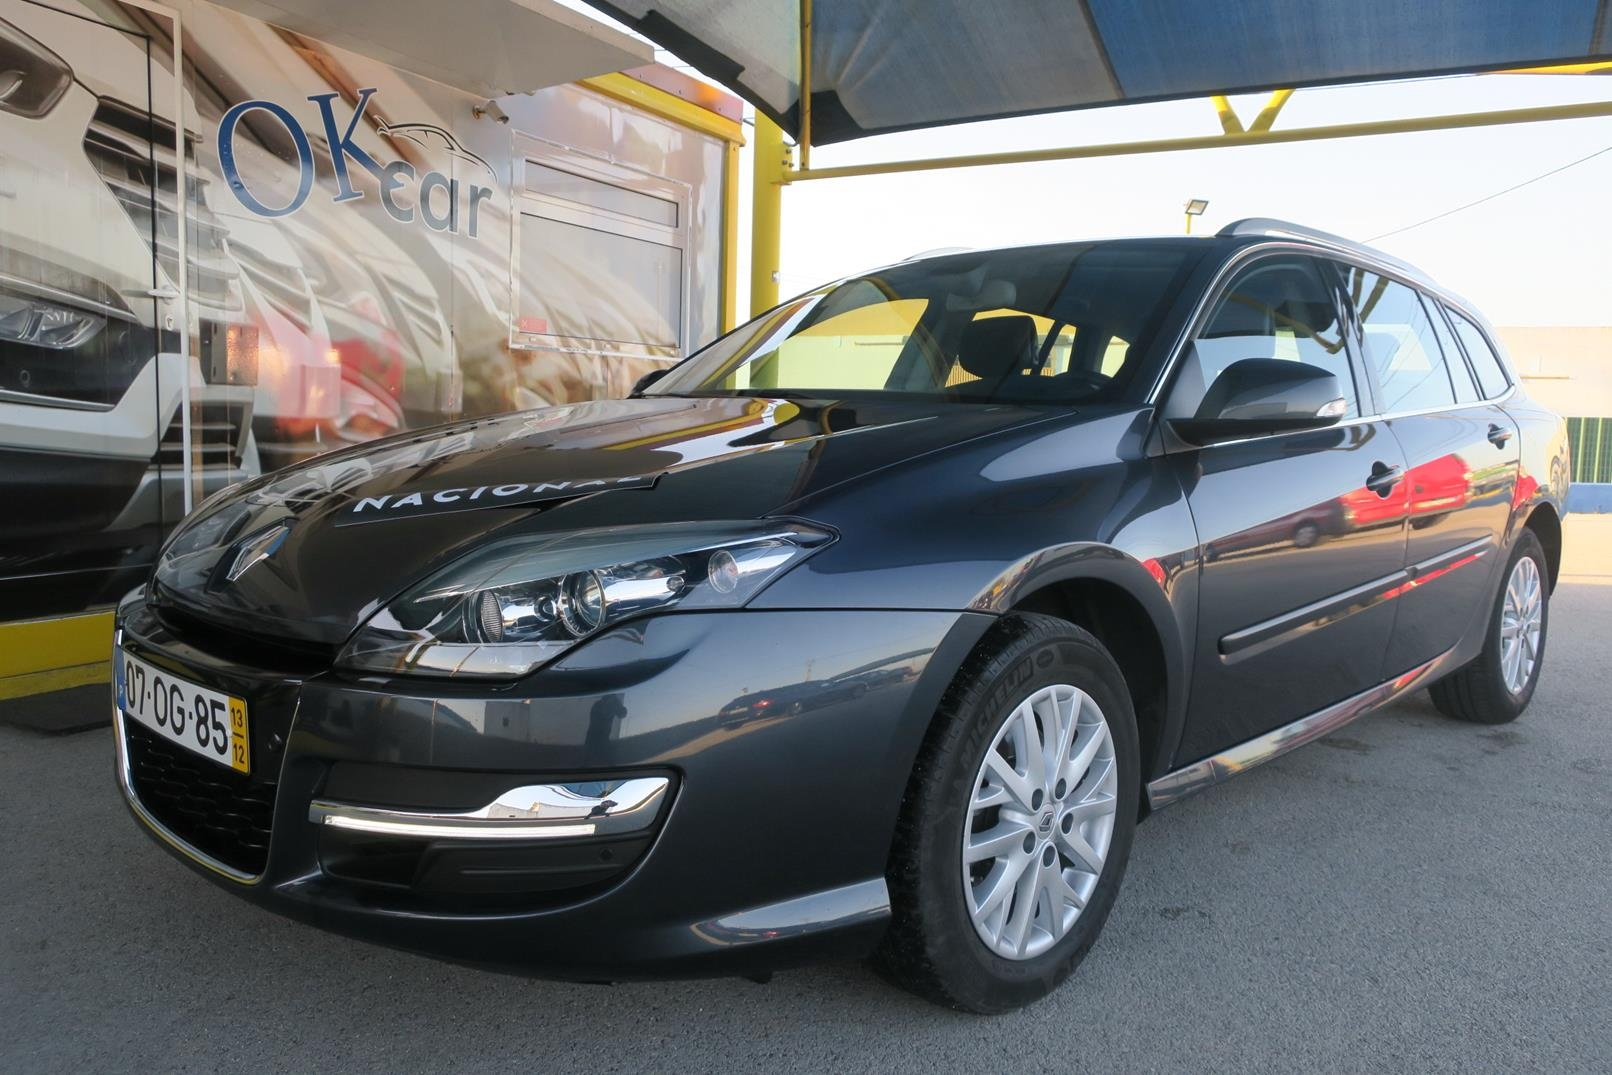 Renault Laguna Break 2.0 dCi Dynamique 150cv